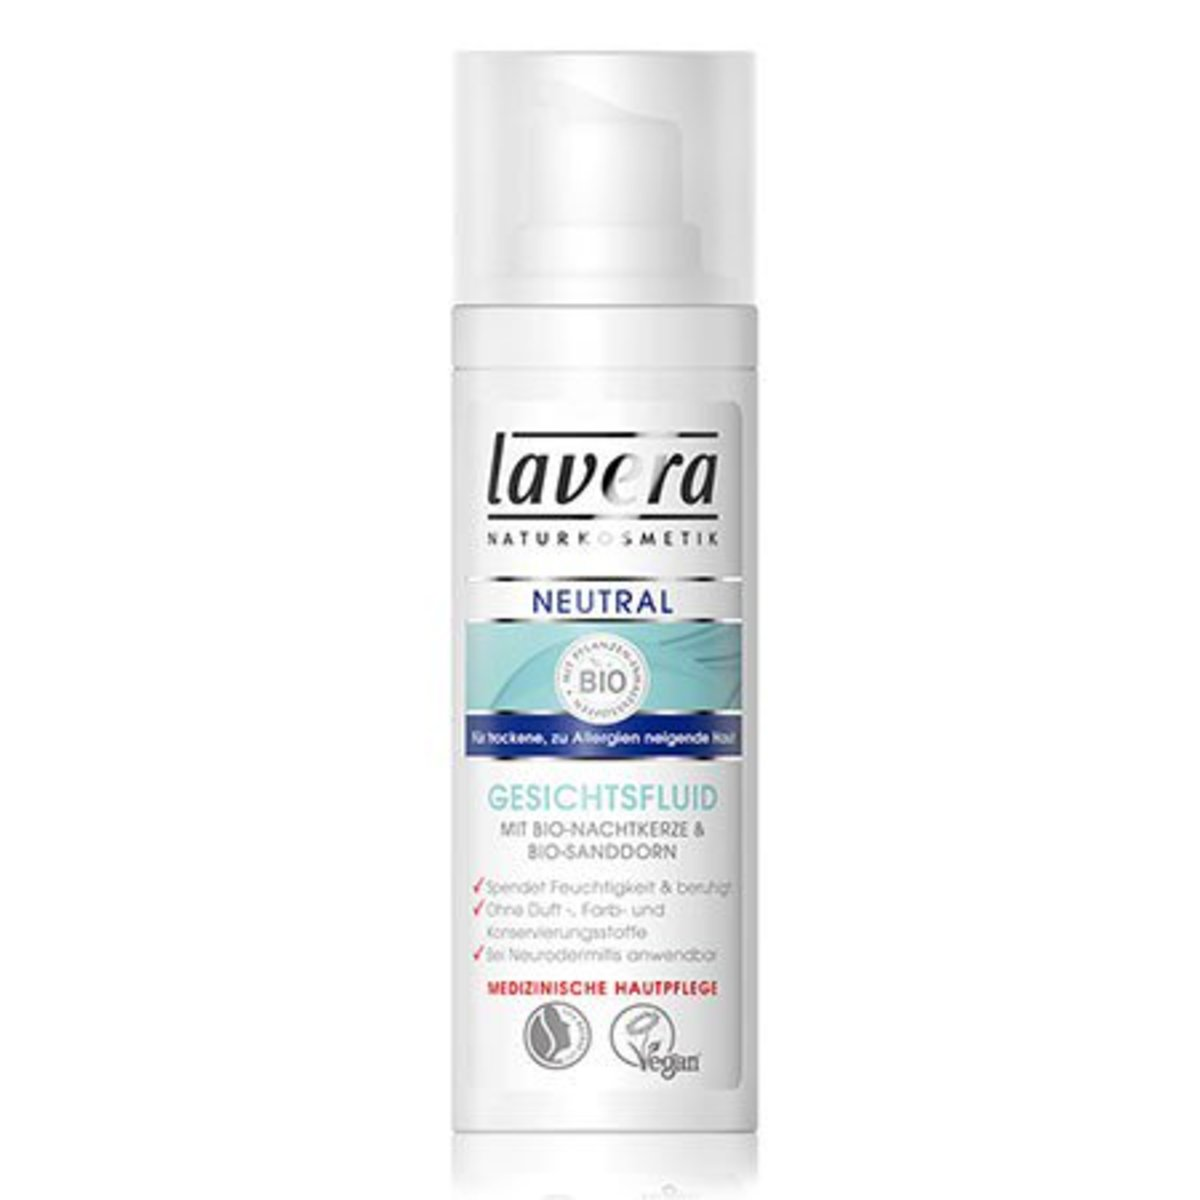 Lavera Neutral Face Fluid